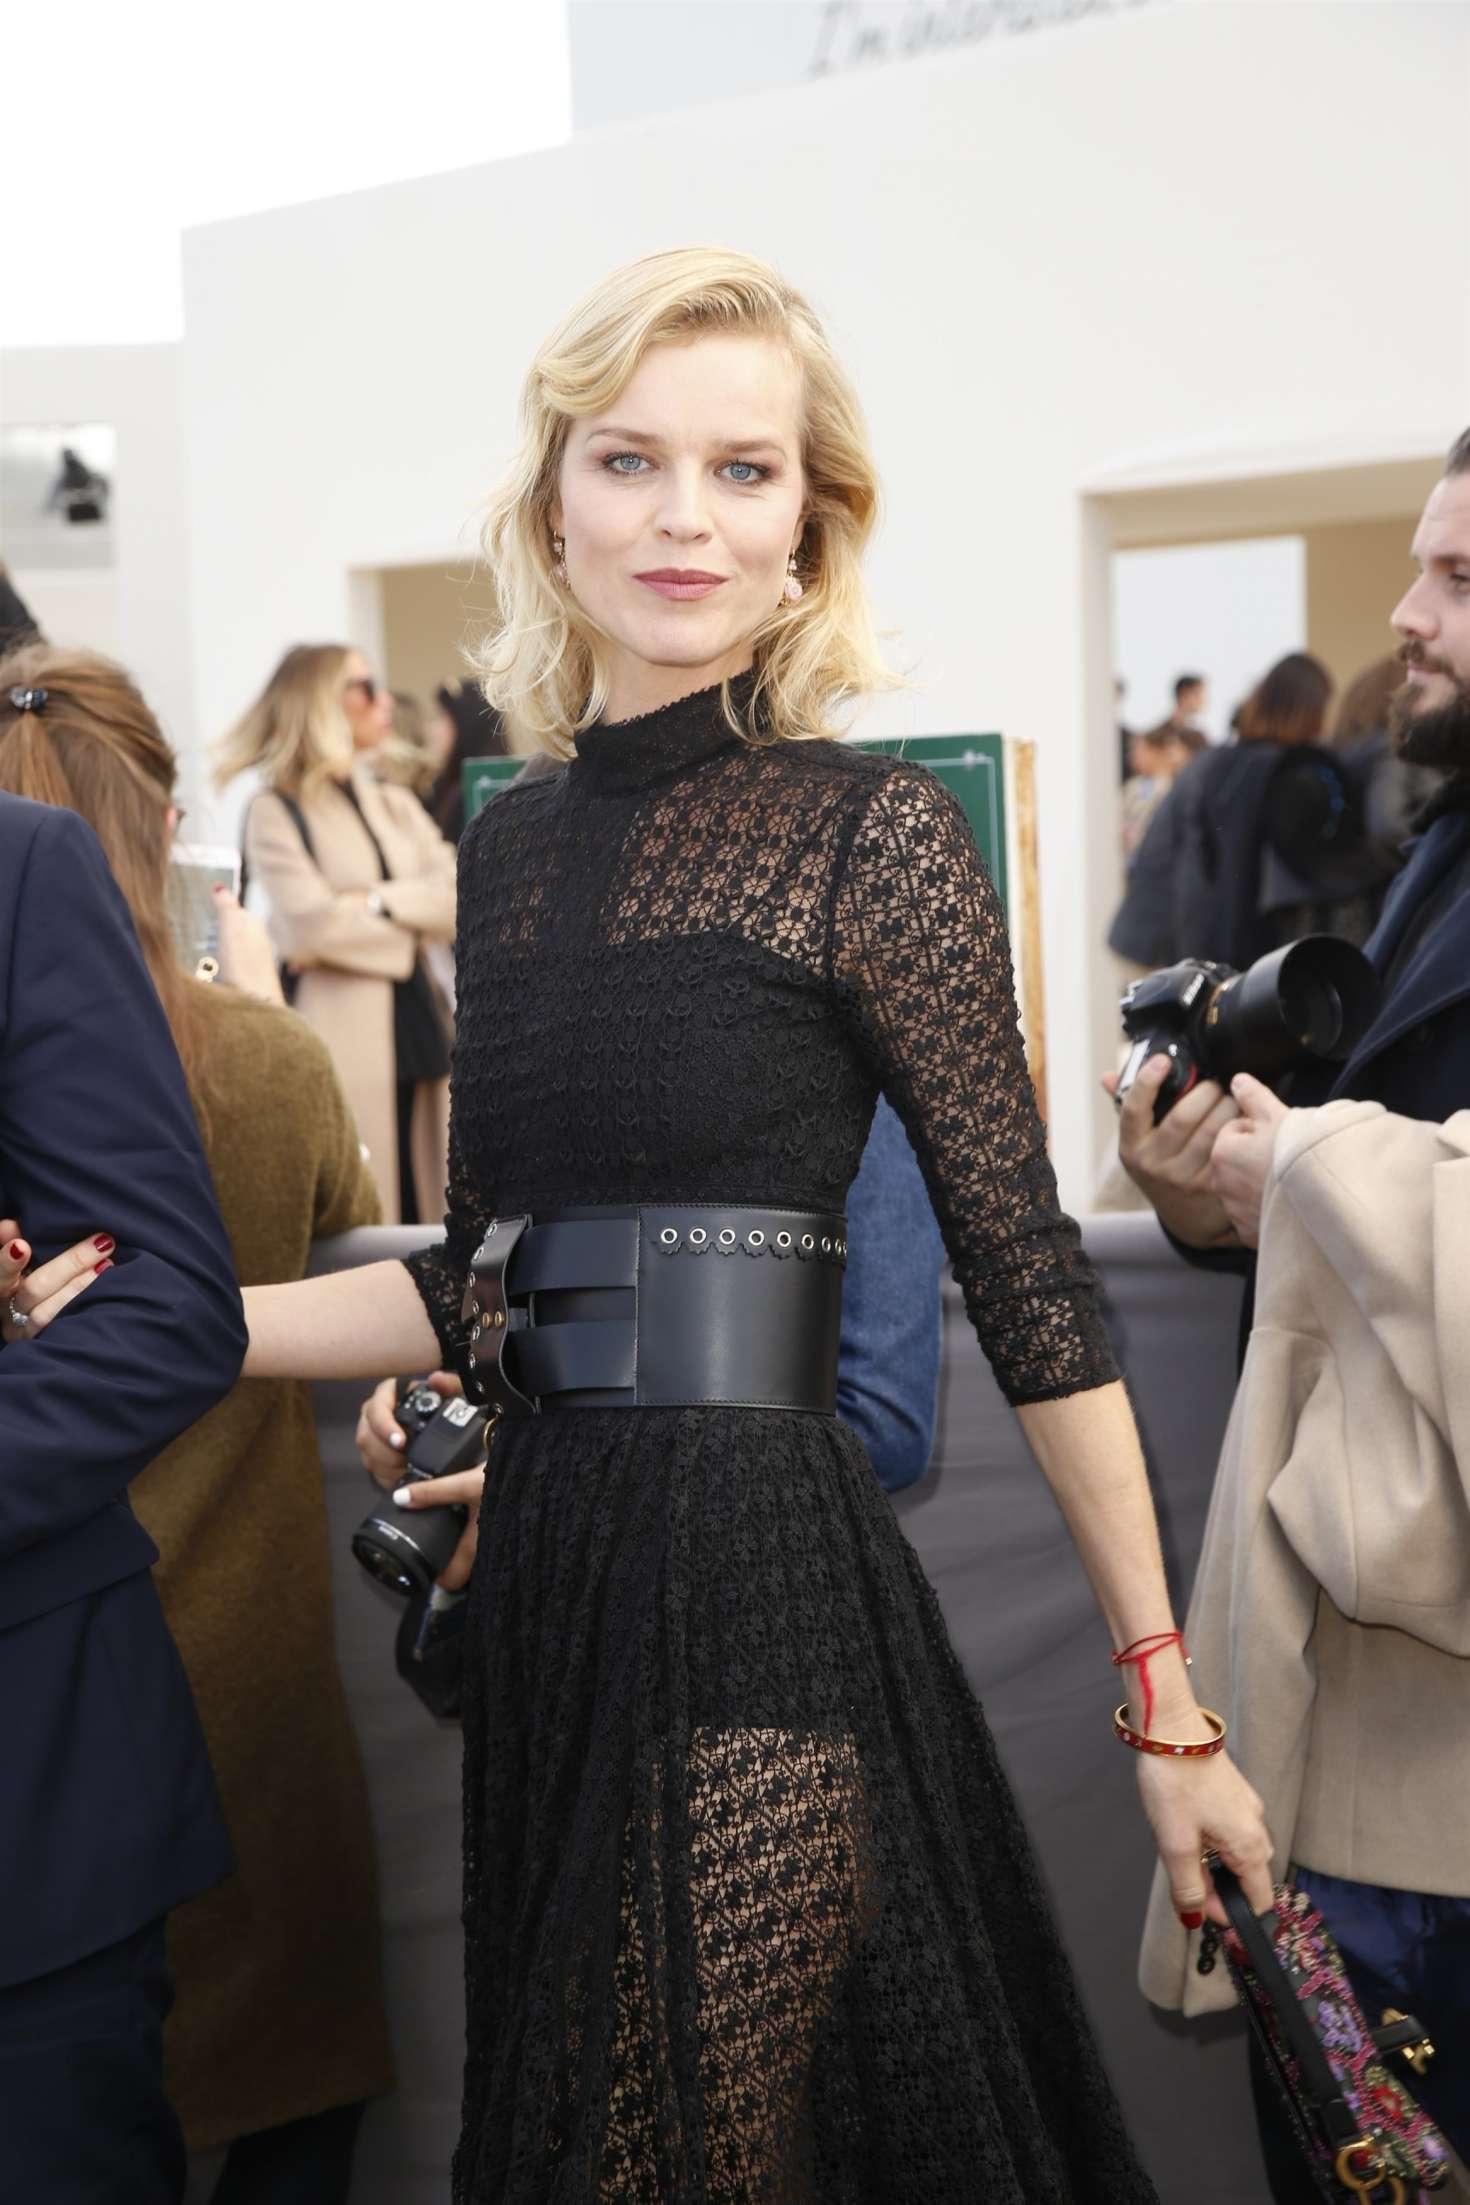 Eva Herzigova - Arrives at the Christian Dior Fashion Show in Paris